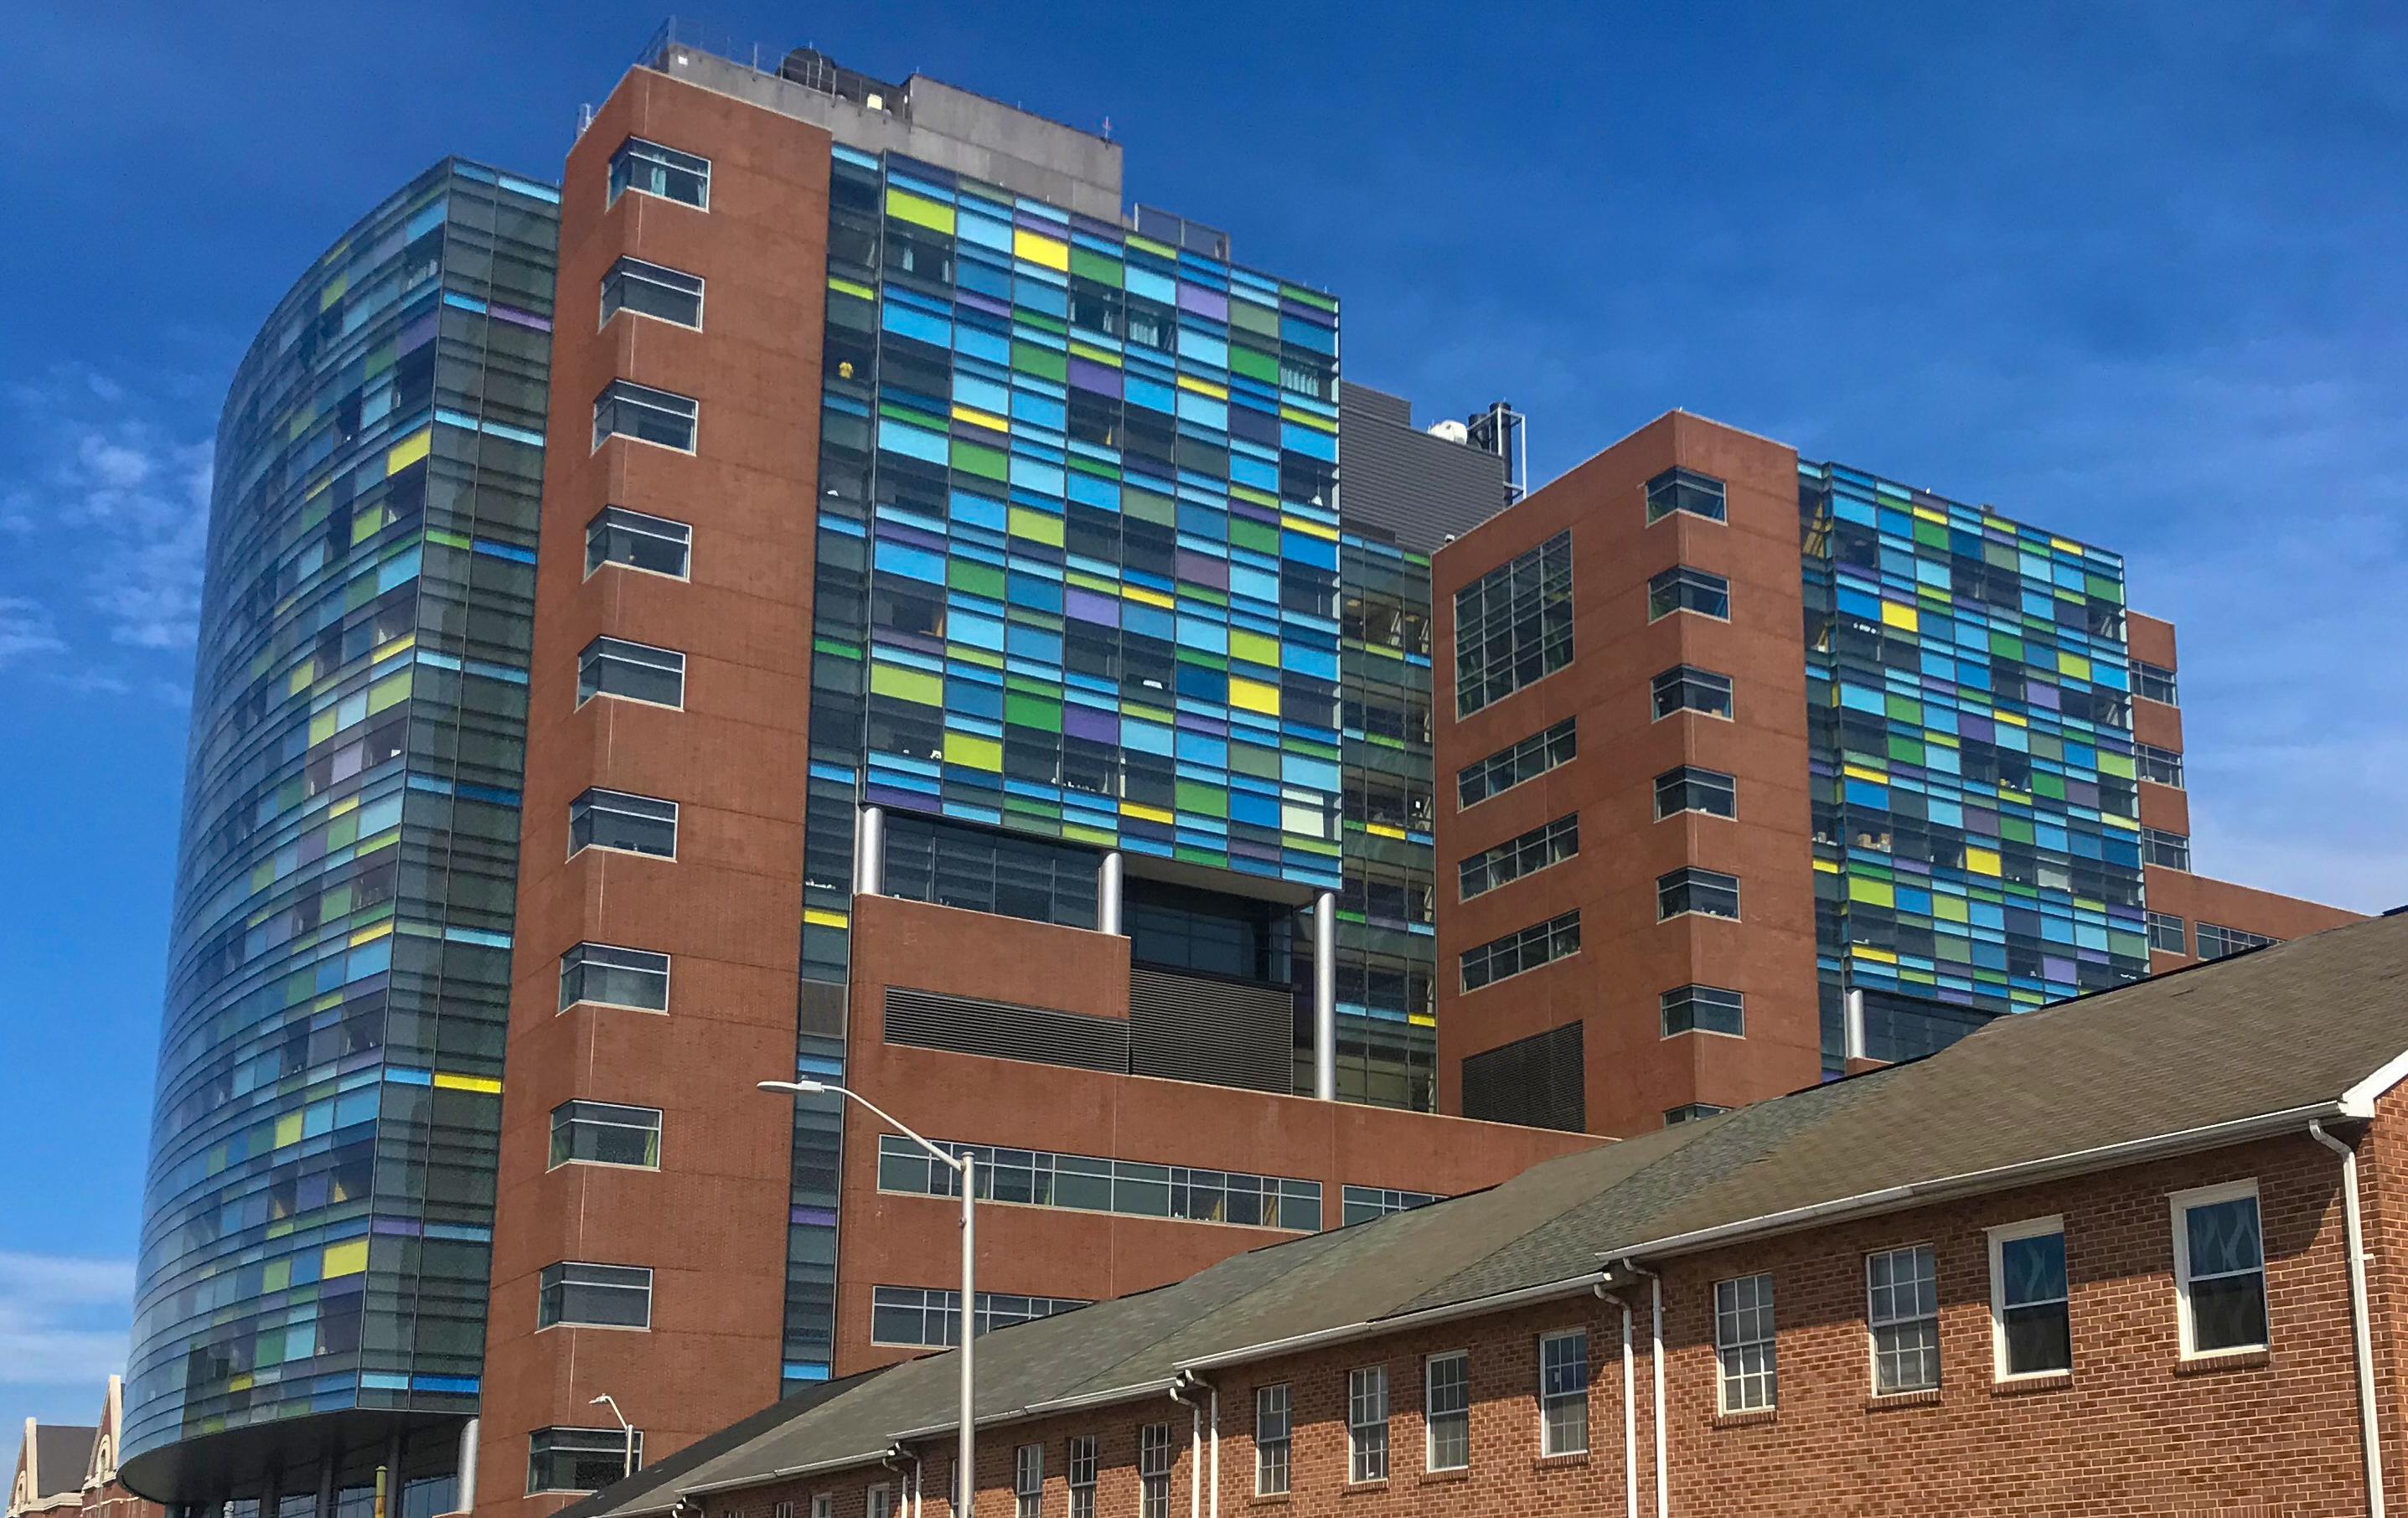 johns hopkins hospital - wikipedia